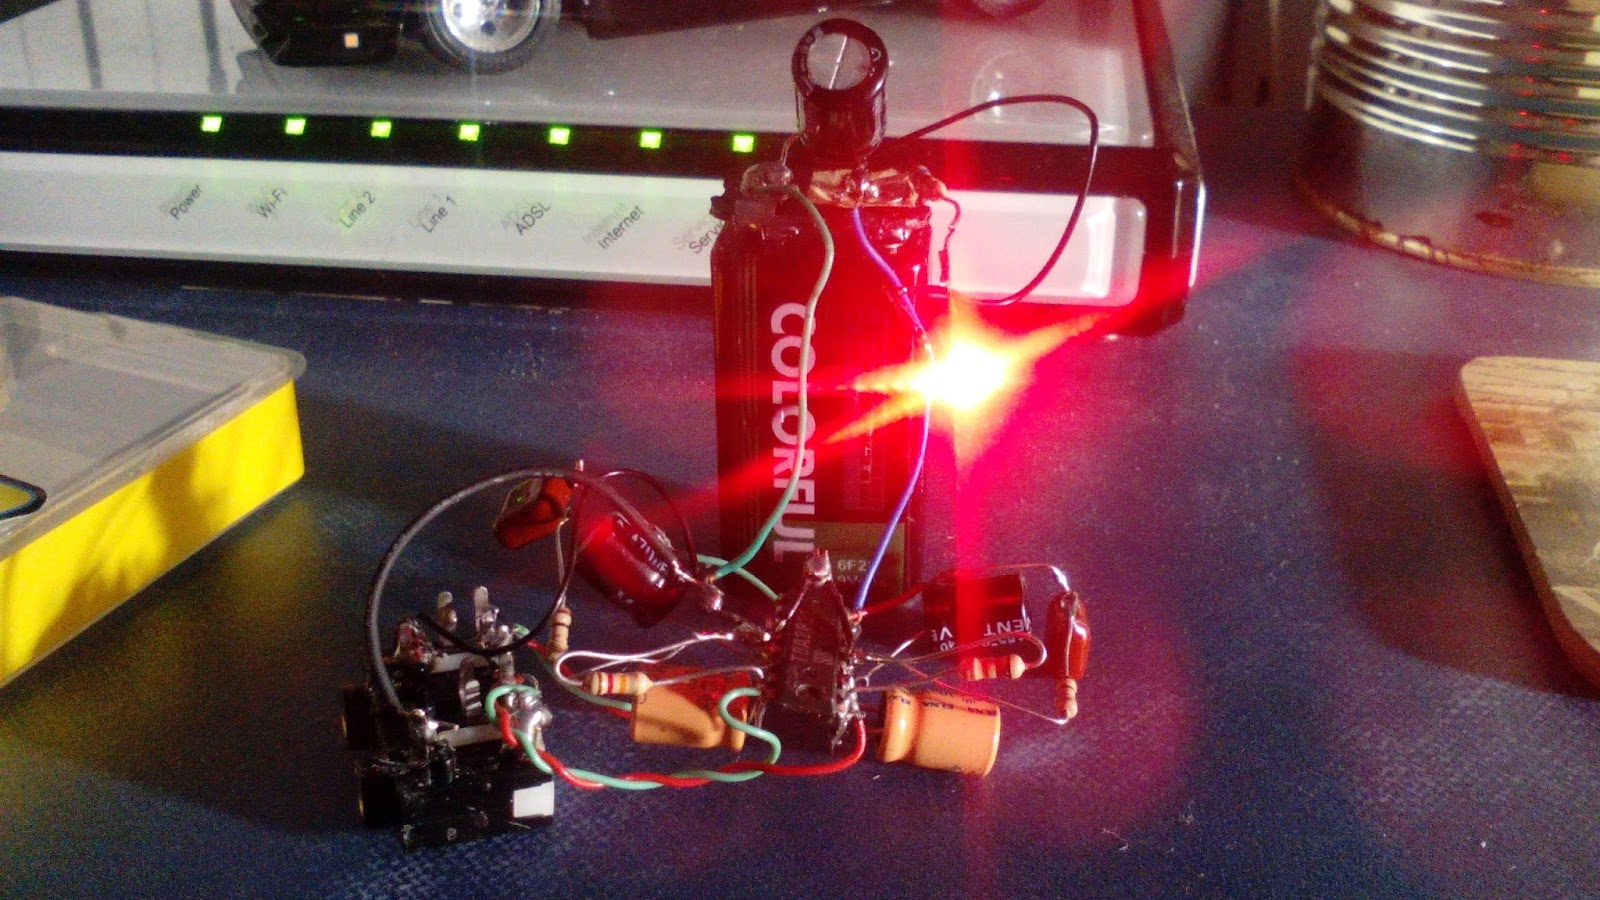 Schema Elettrico Jack 3 5 : Techjams : schemi elettrici amplificatore per cuffie con tda2822